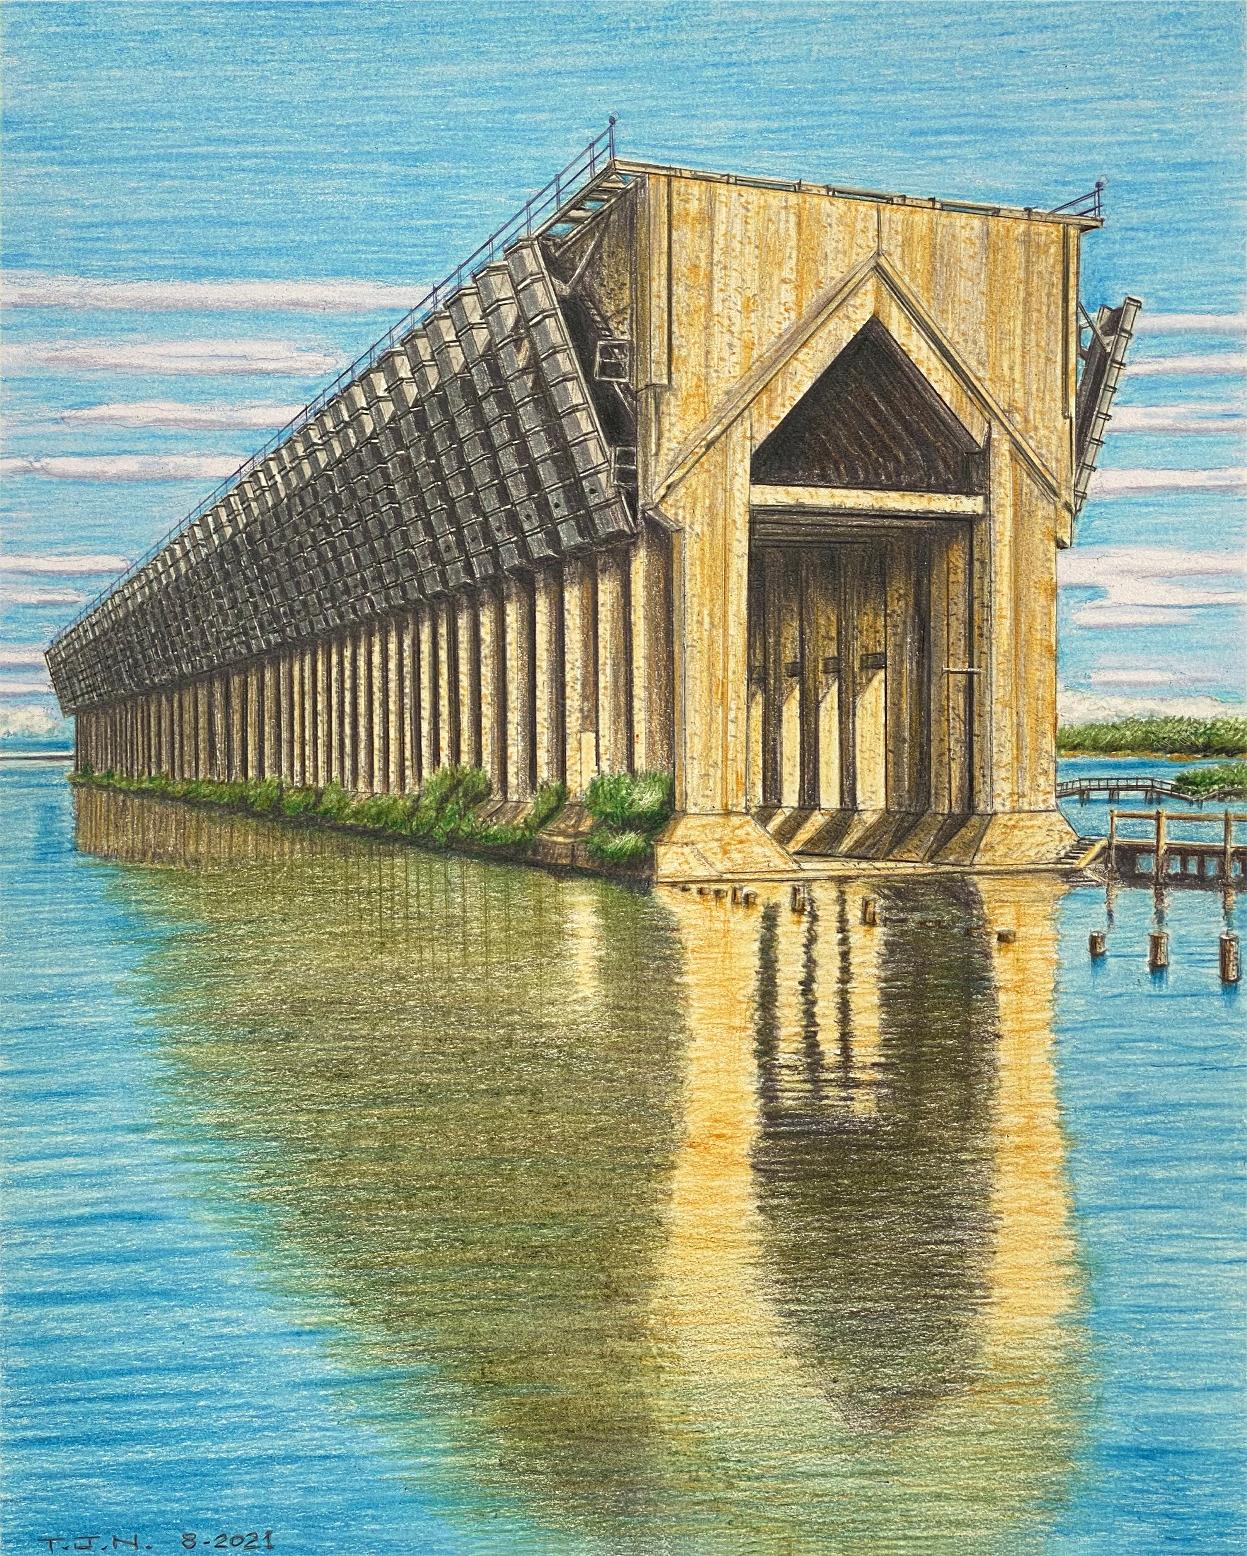 Old Iron Ore Dock